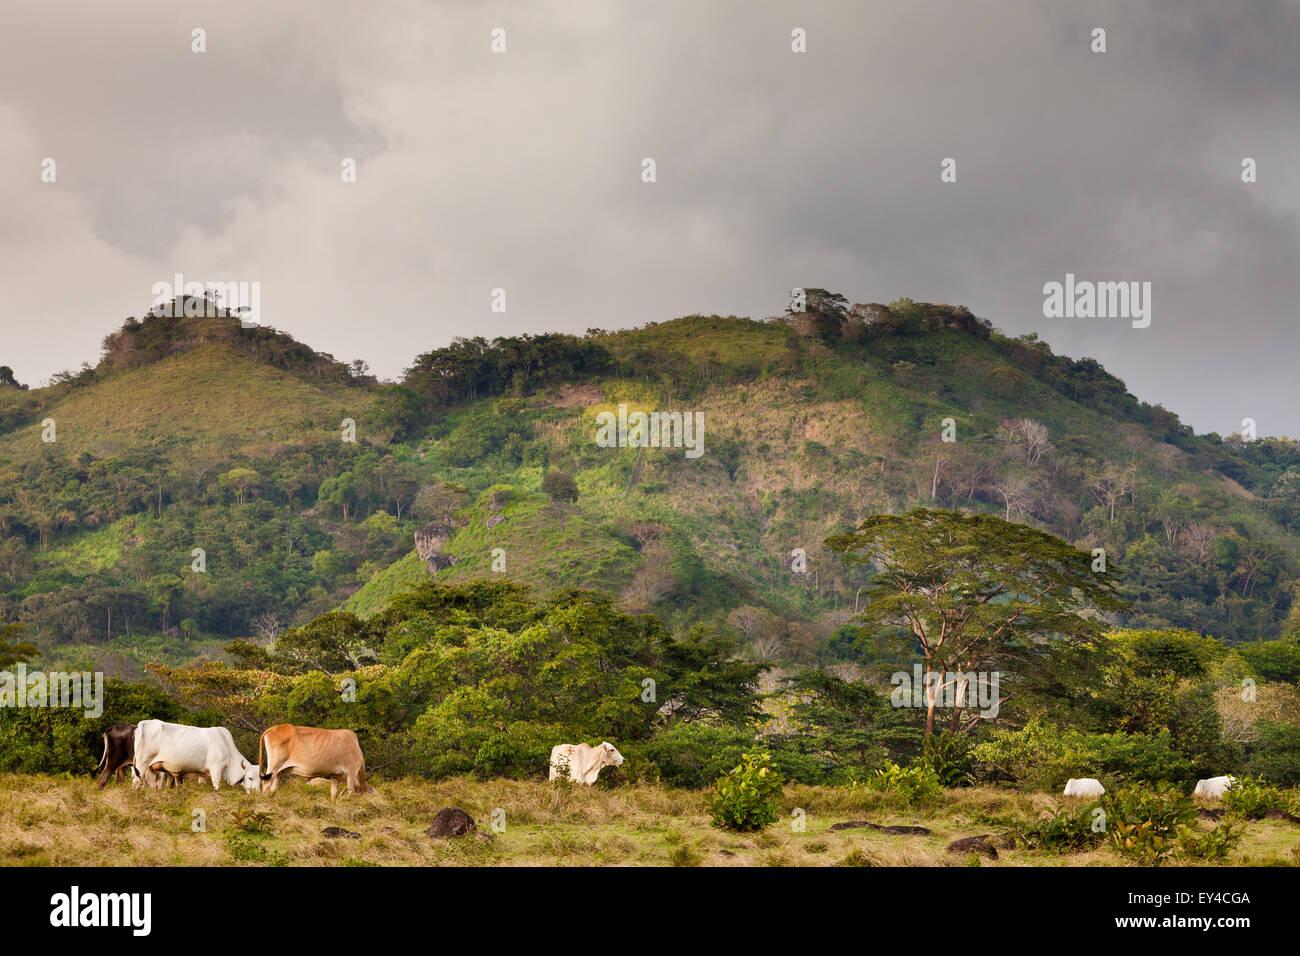 Cattle in the farmlands near La Pintada in the Cocle province, Republic of Panama. Stock Photo